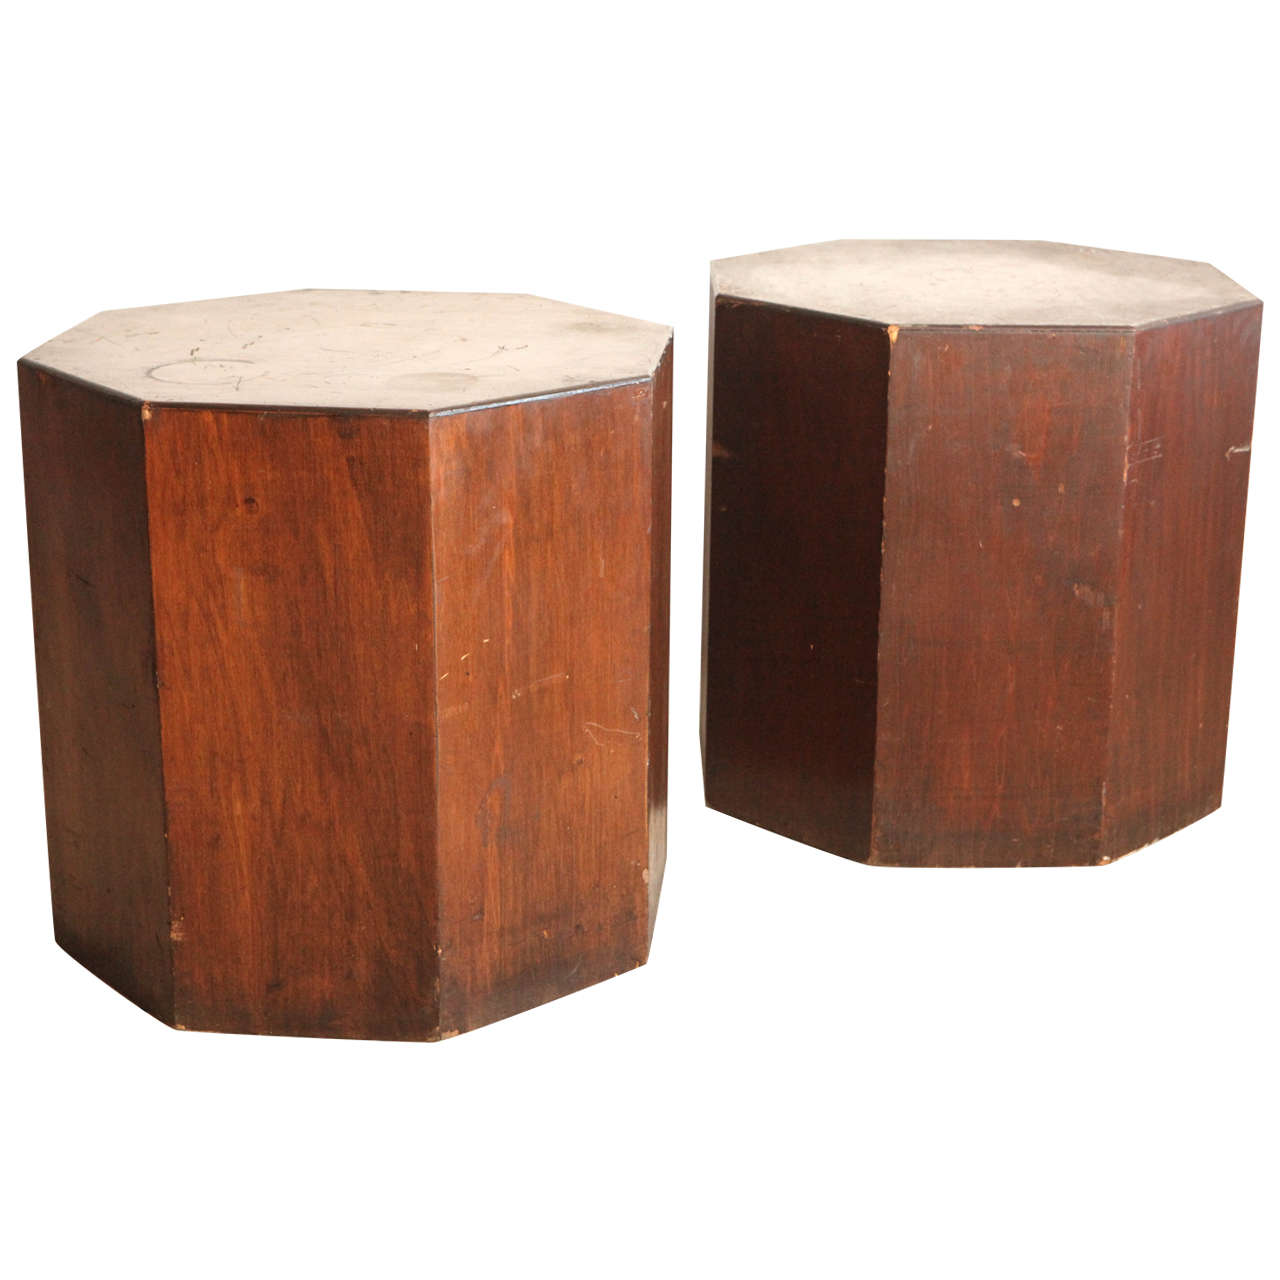 Rustic Wood Octagonal Prism Side Tables 1